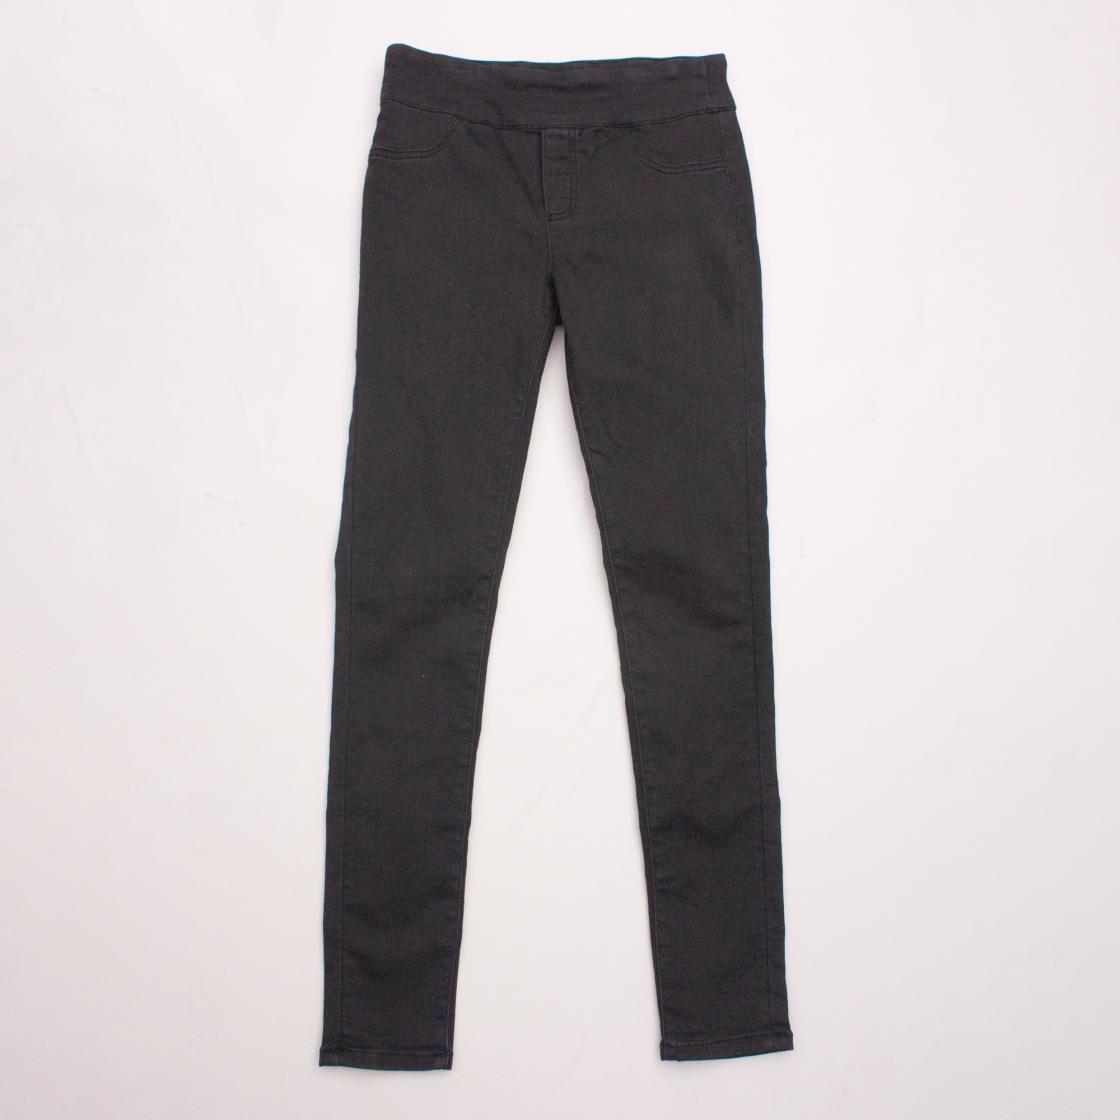 H&M Distressed Denim Jeans